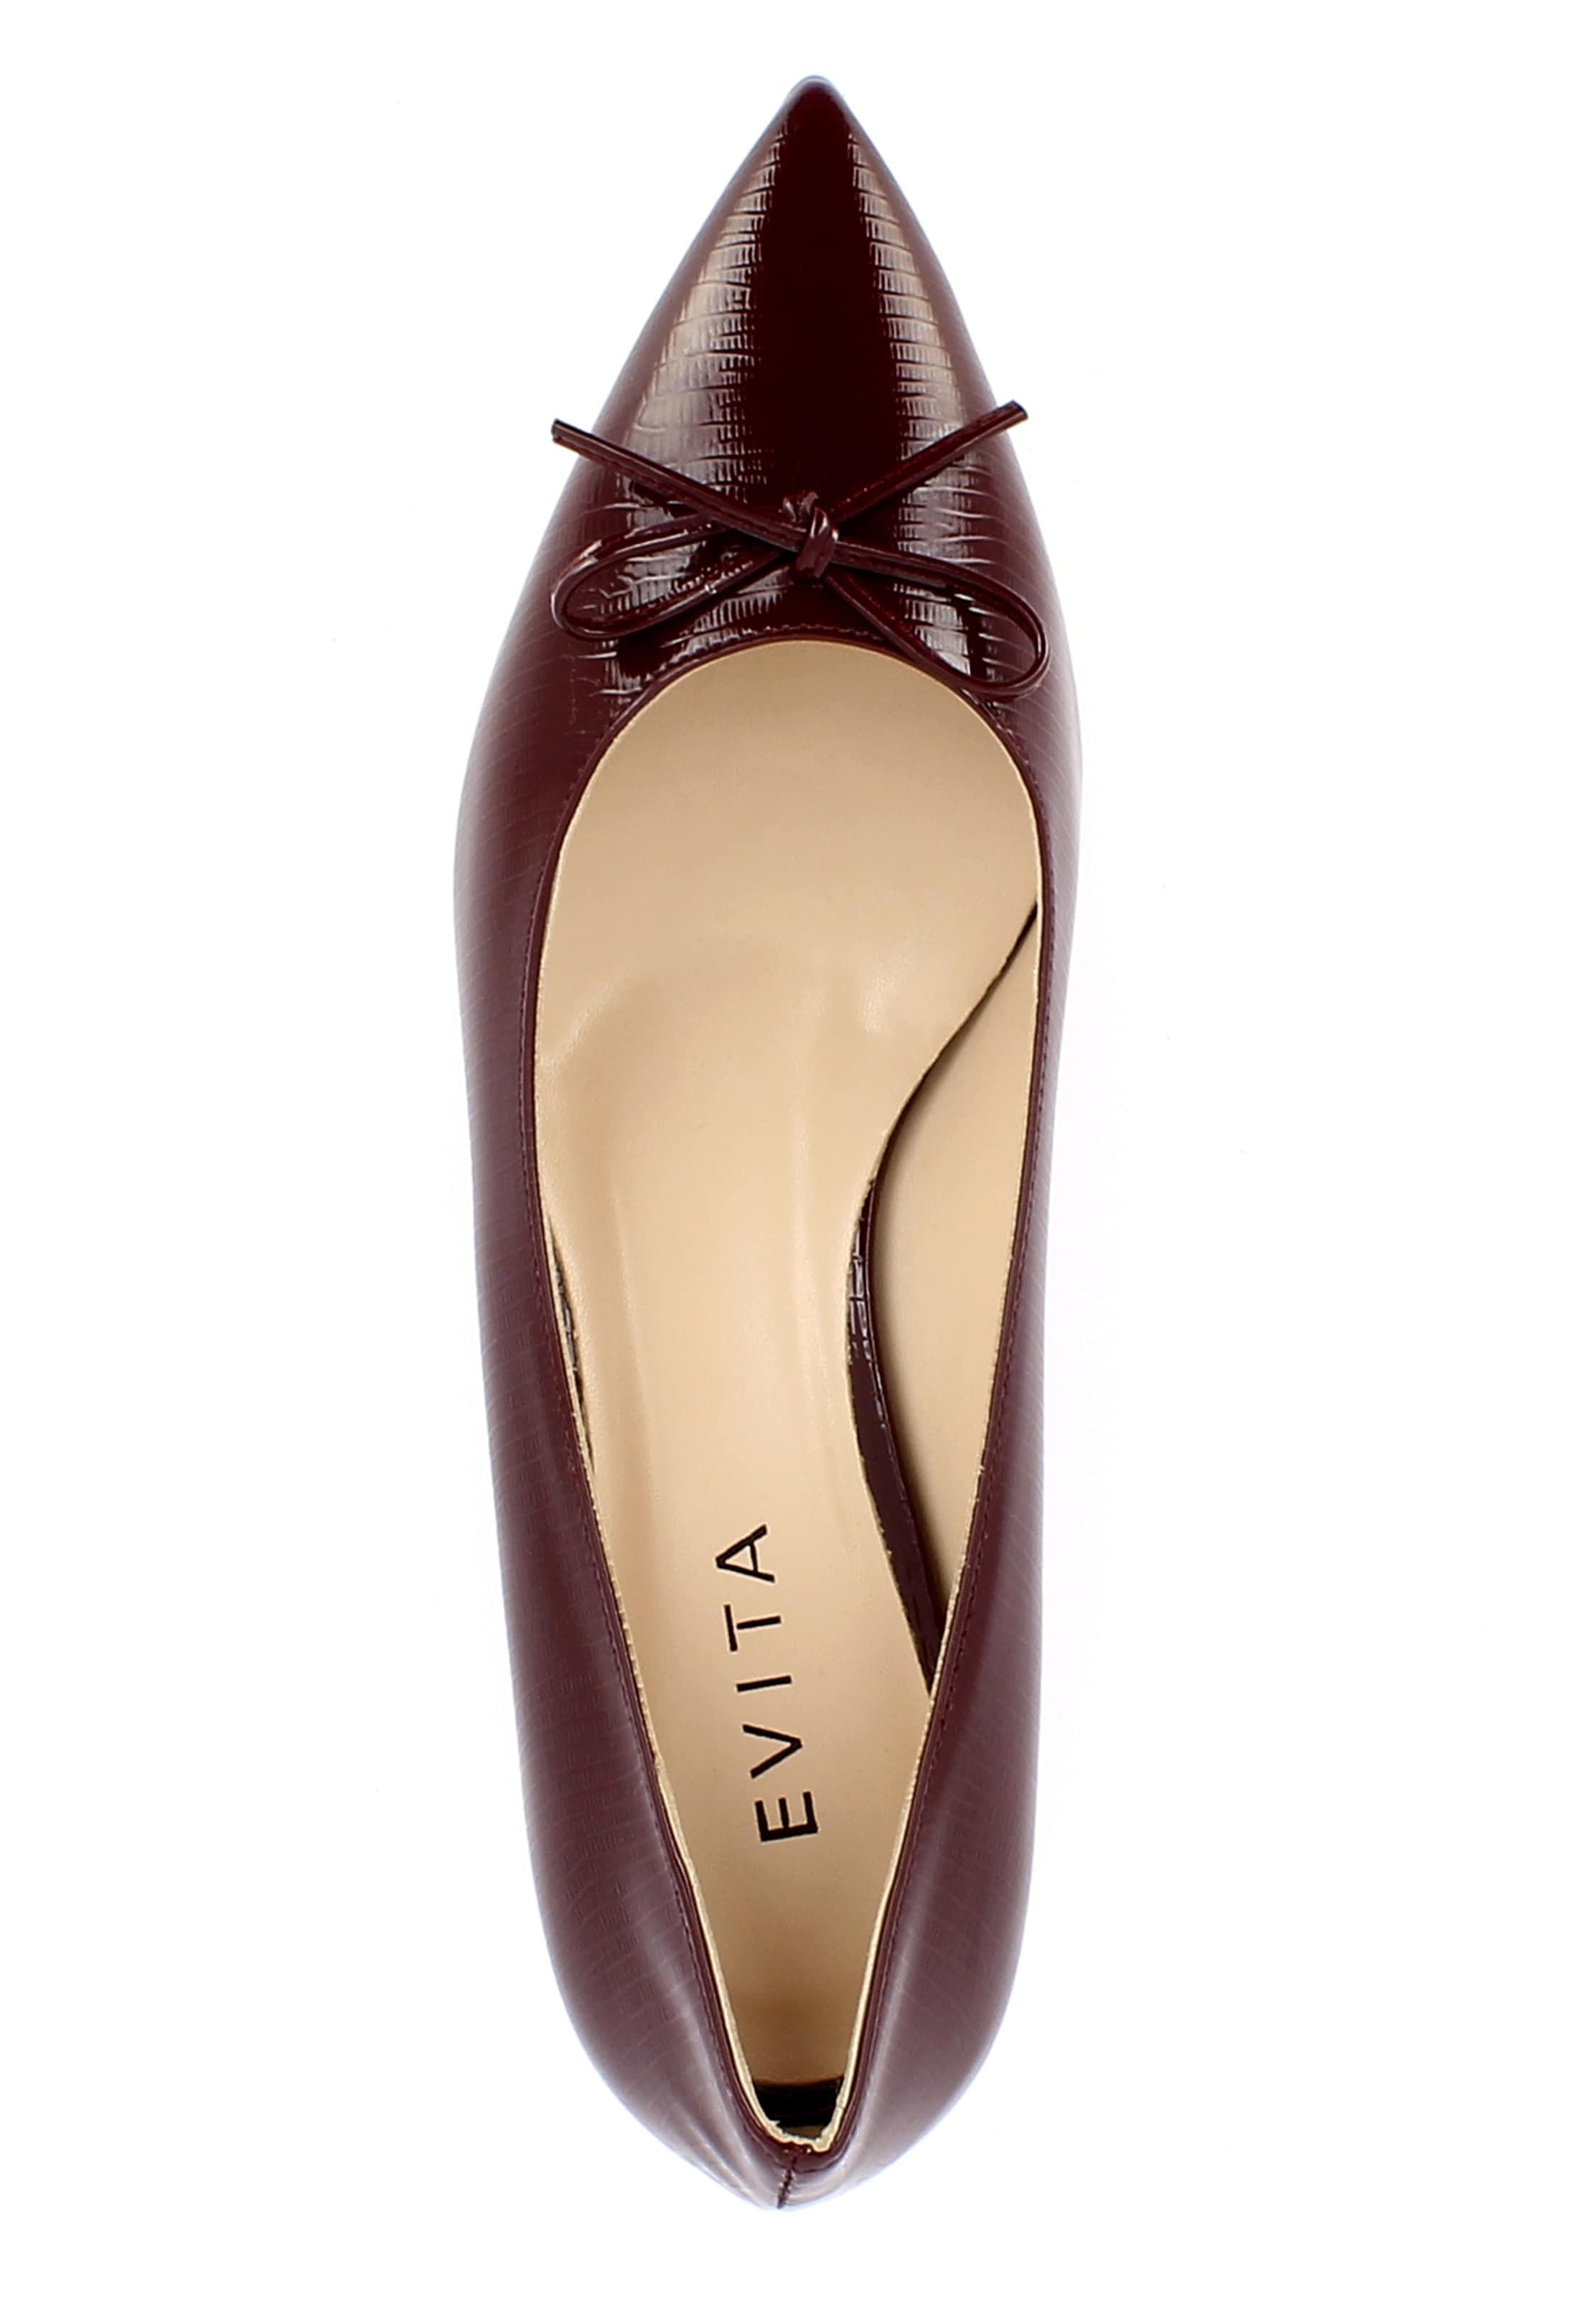 Escarpins Evita Bordeaux Escarpins En Bordeaux Evita Bordeaux Escarpins En Evita En Evita Escarpins 8NOm0vnw